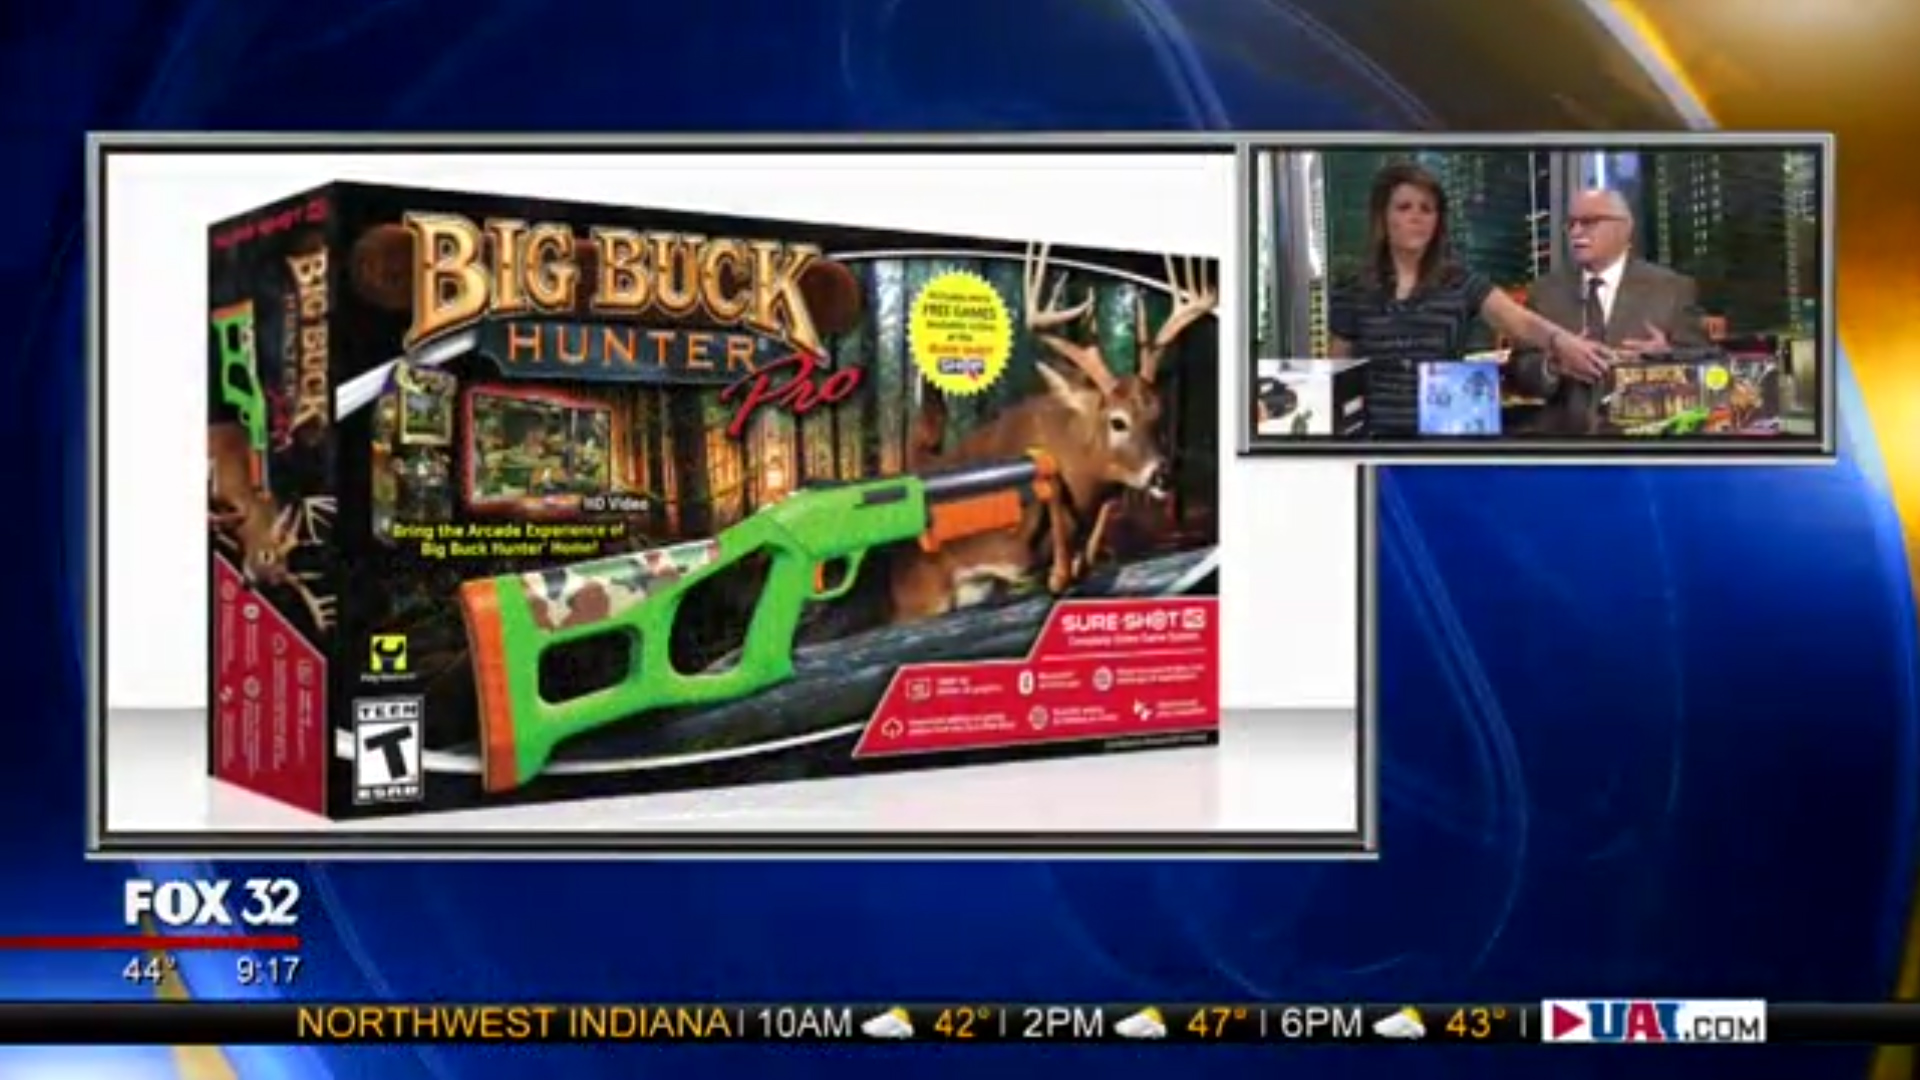 Sure Shot HD - Big Buck Bundle - www.SureShotHD.com$99.00